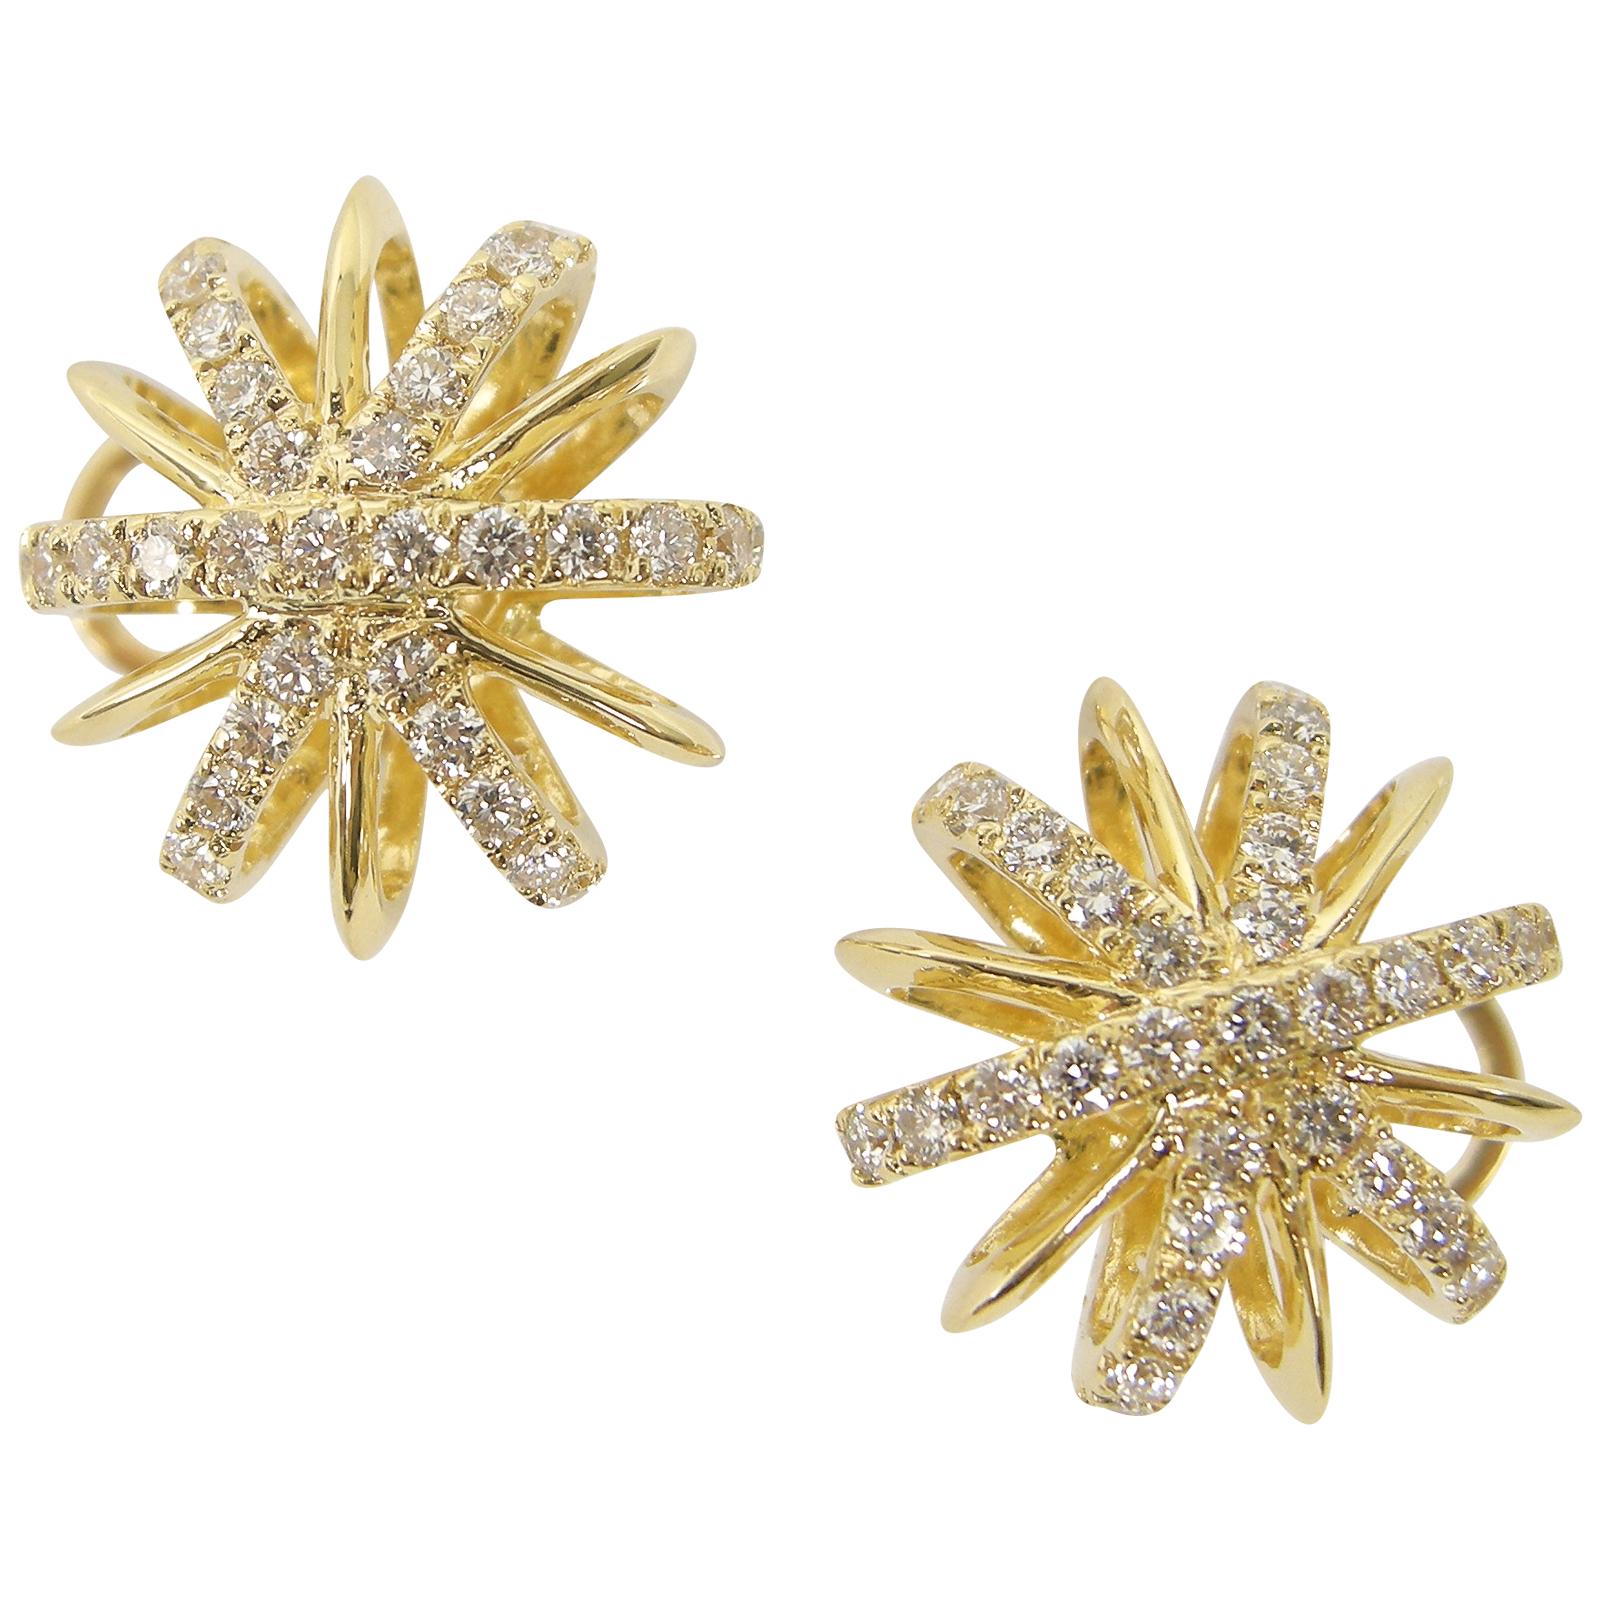 DIAMOND SNOWFLAKE STUD EARRINGS CLUSTER DIAMOND PENDANT BESPOKE FINE JEWELLERY BY SHAHINA HATTA